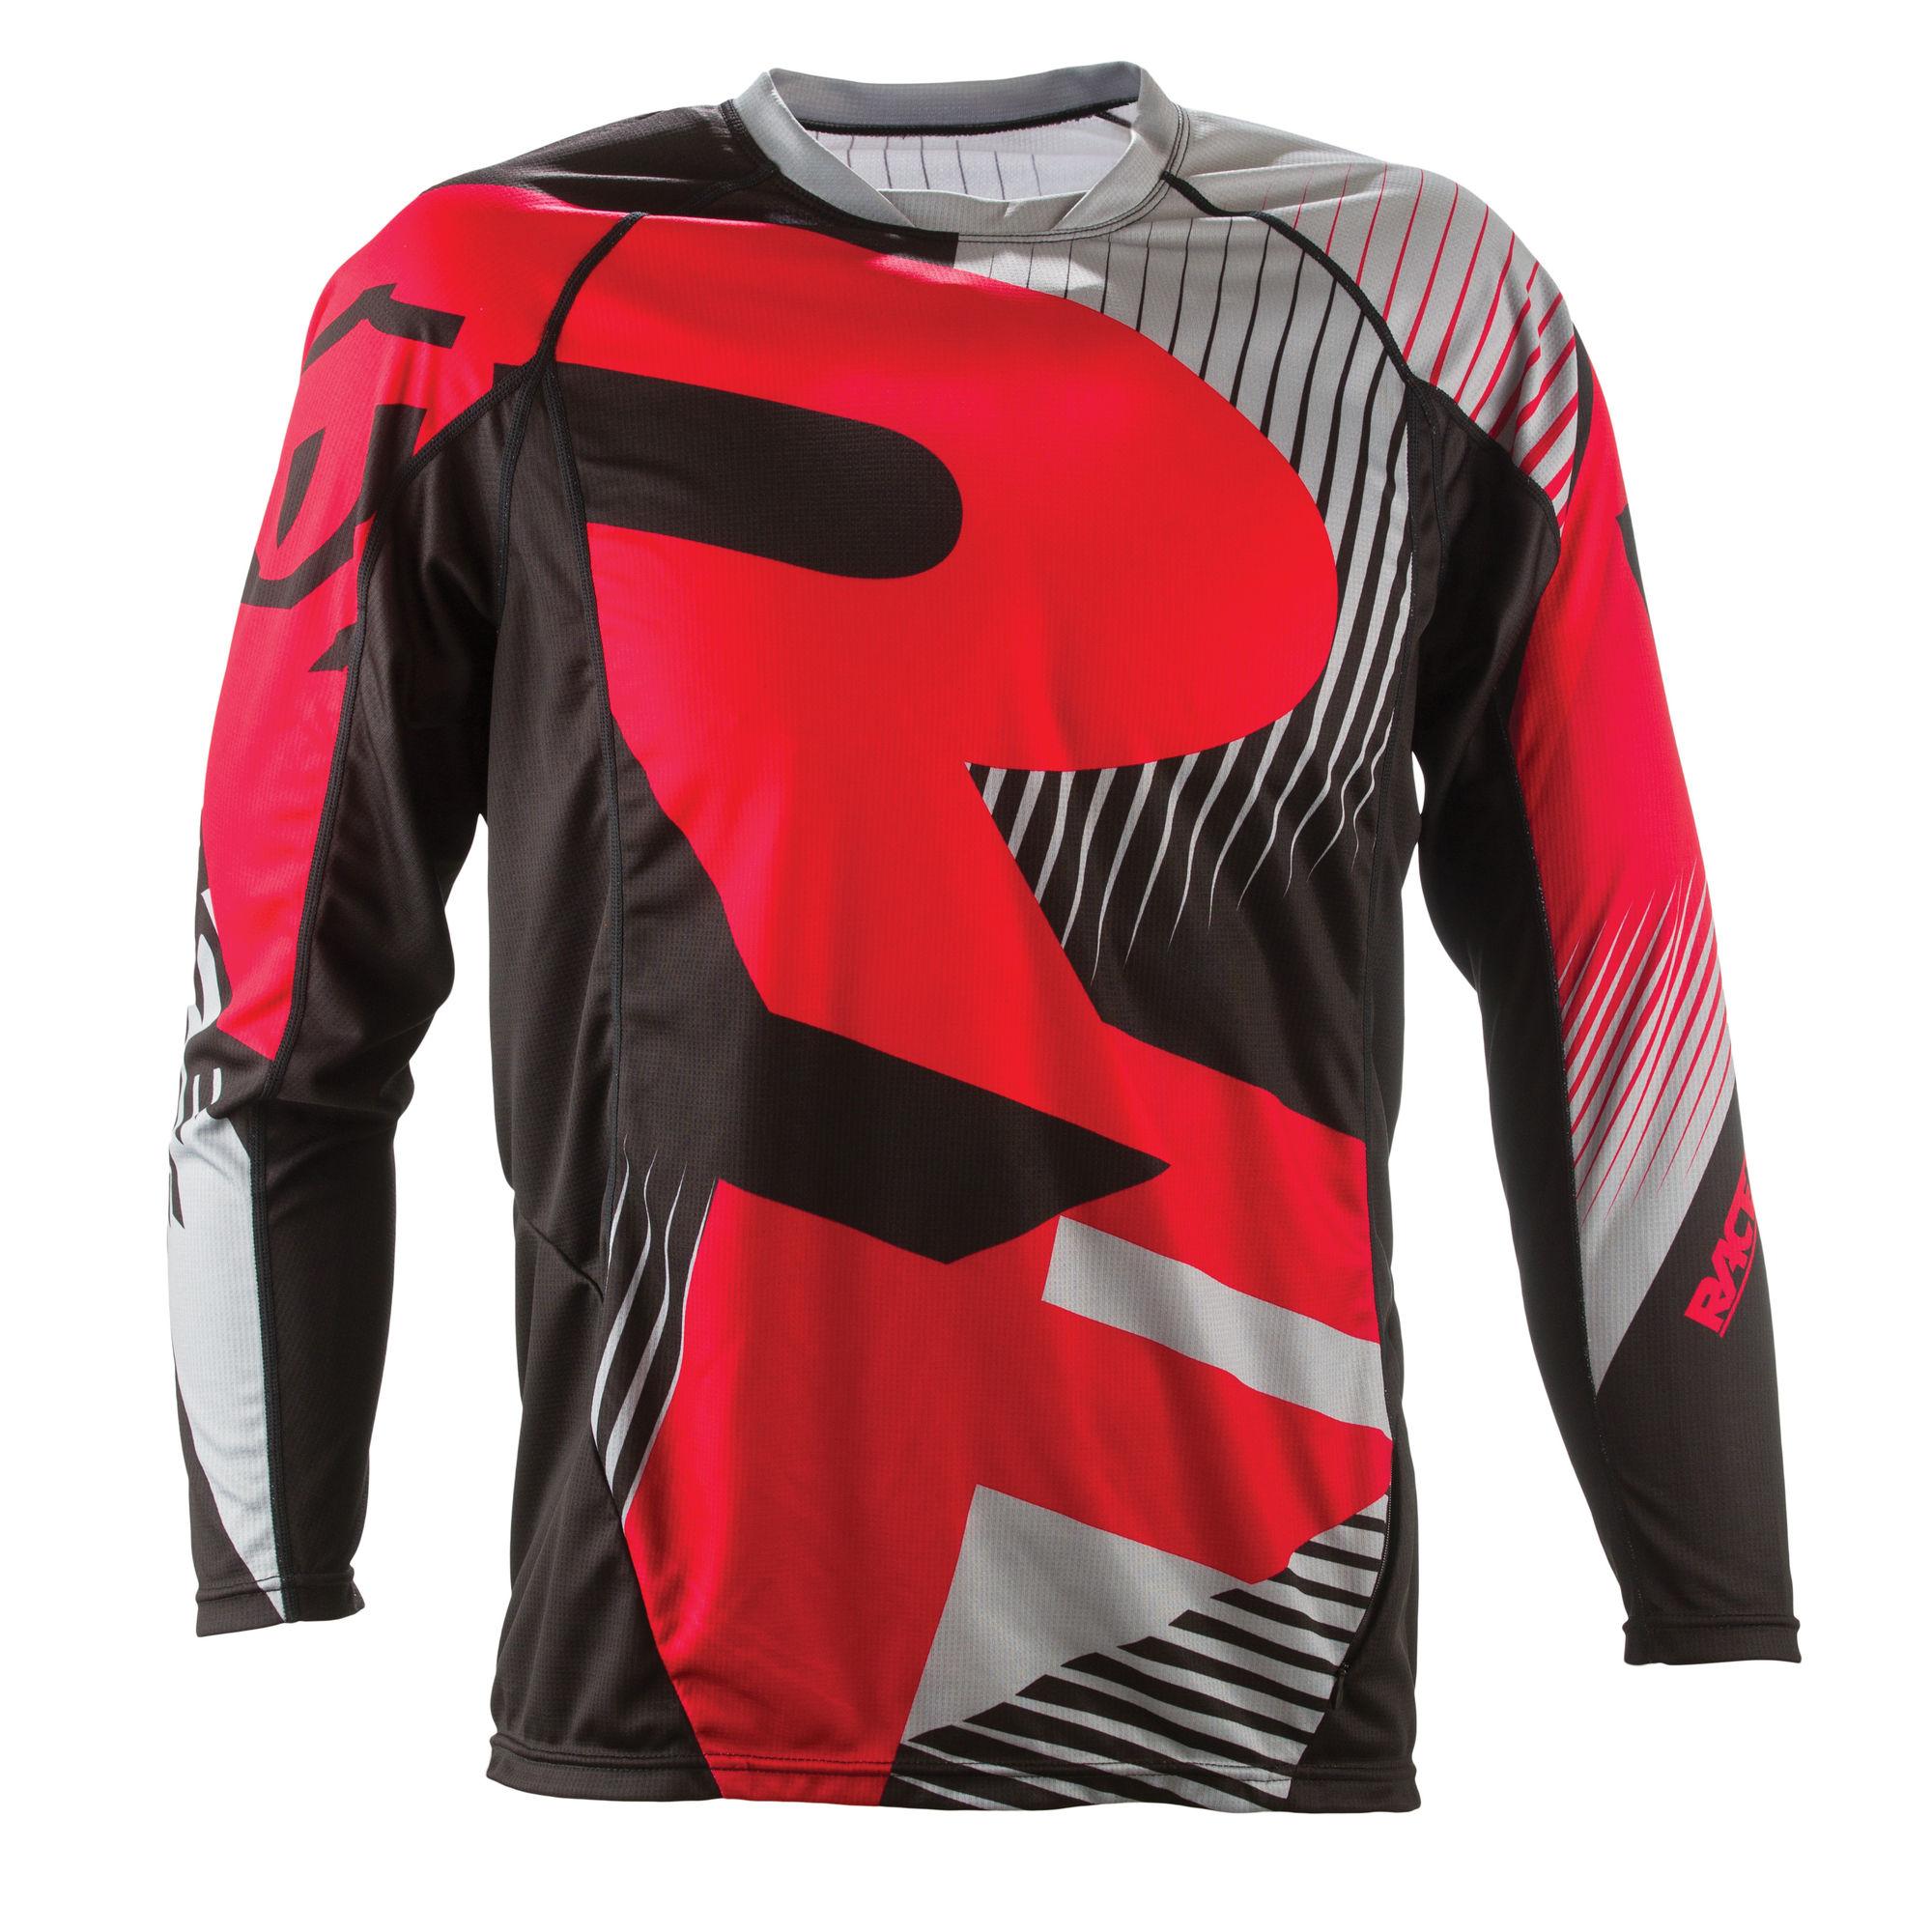 Race-Face-Ambush-Long-Sleeve-Jersey-Long-Sleeve-jersey